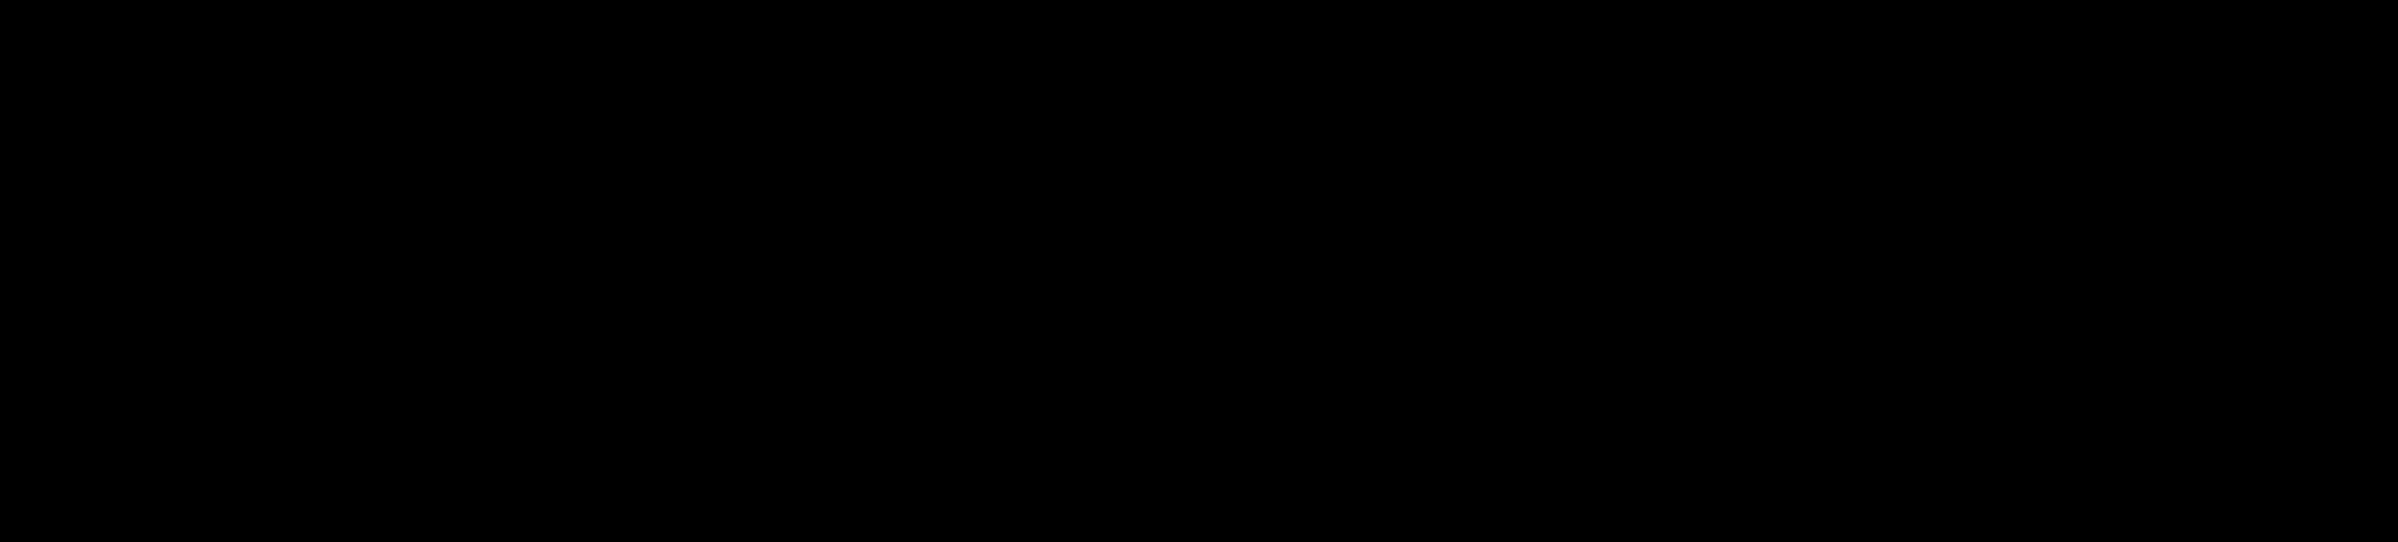 vector clipart banner - photo #9